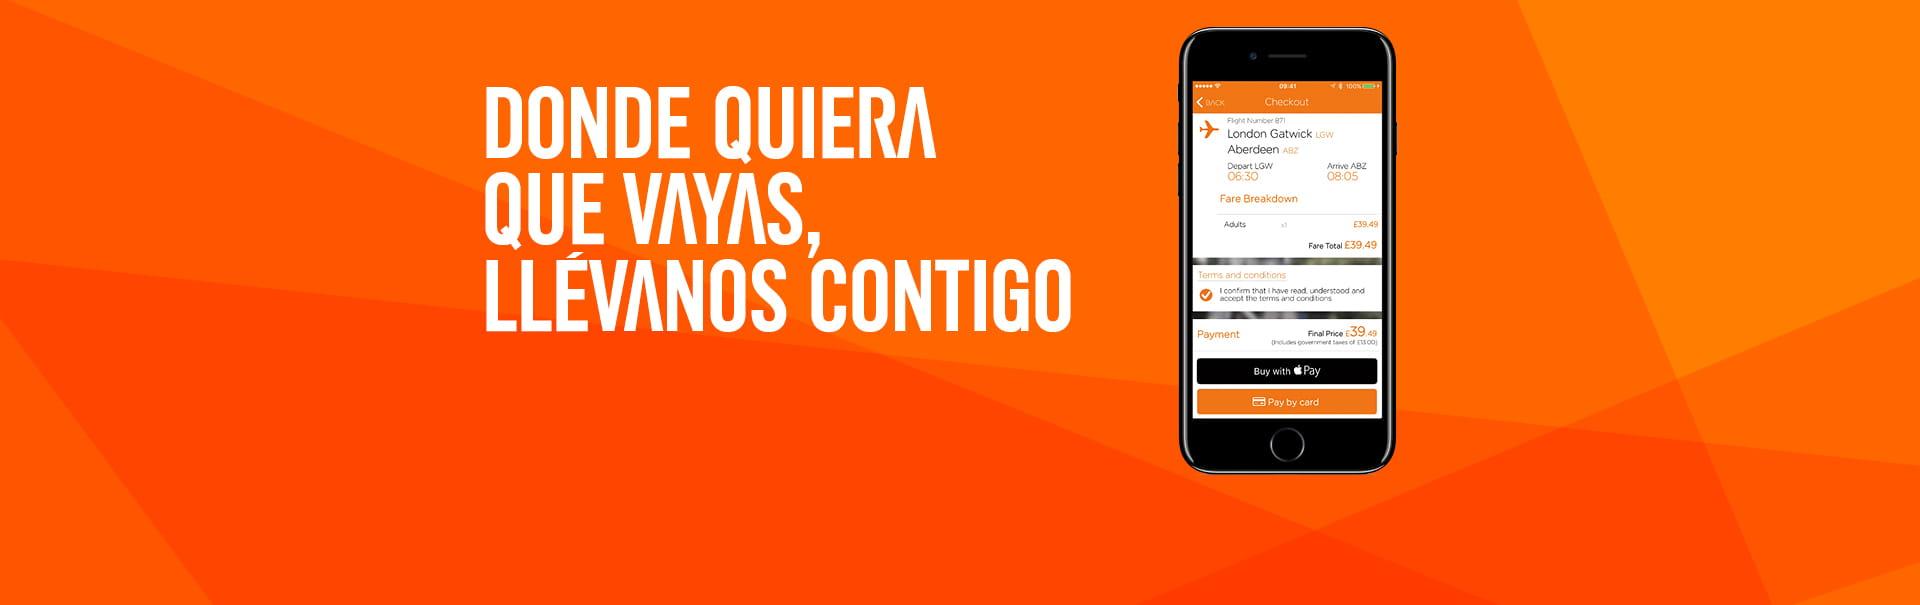 app easyjet